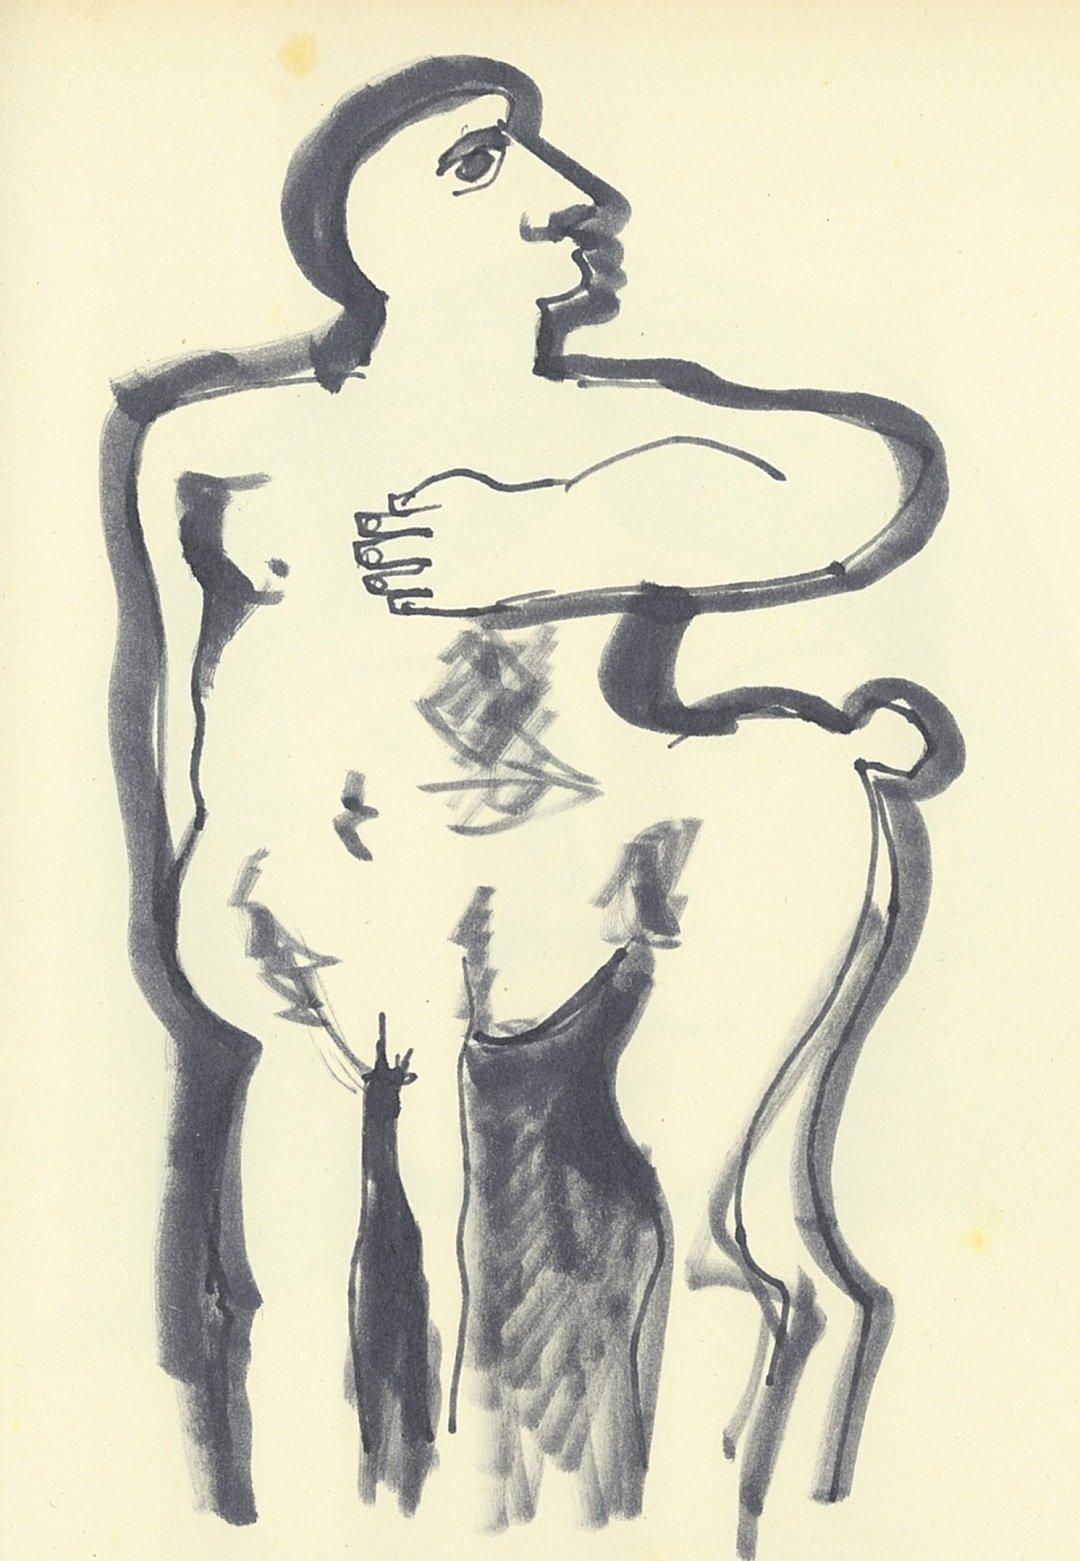 Kobe – Centauro (Centaur) - drawing - 2006 – (© Kobe)